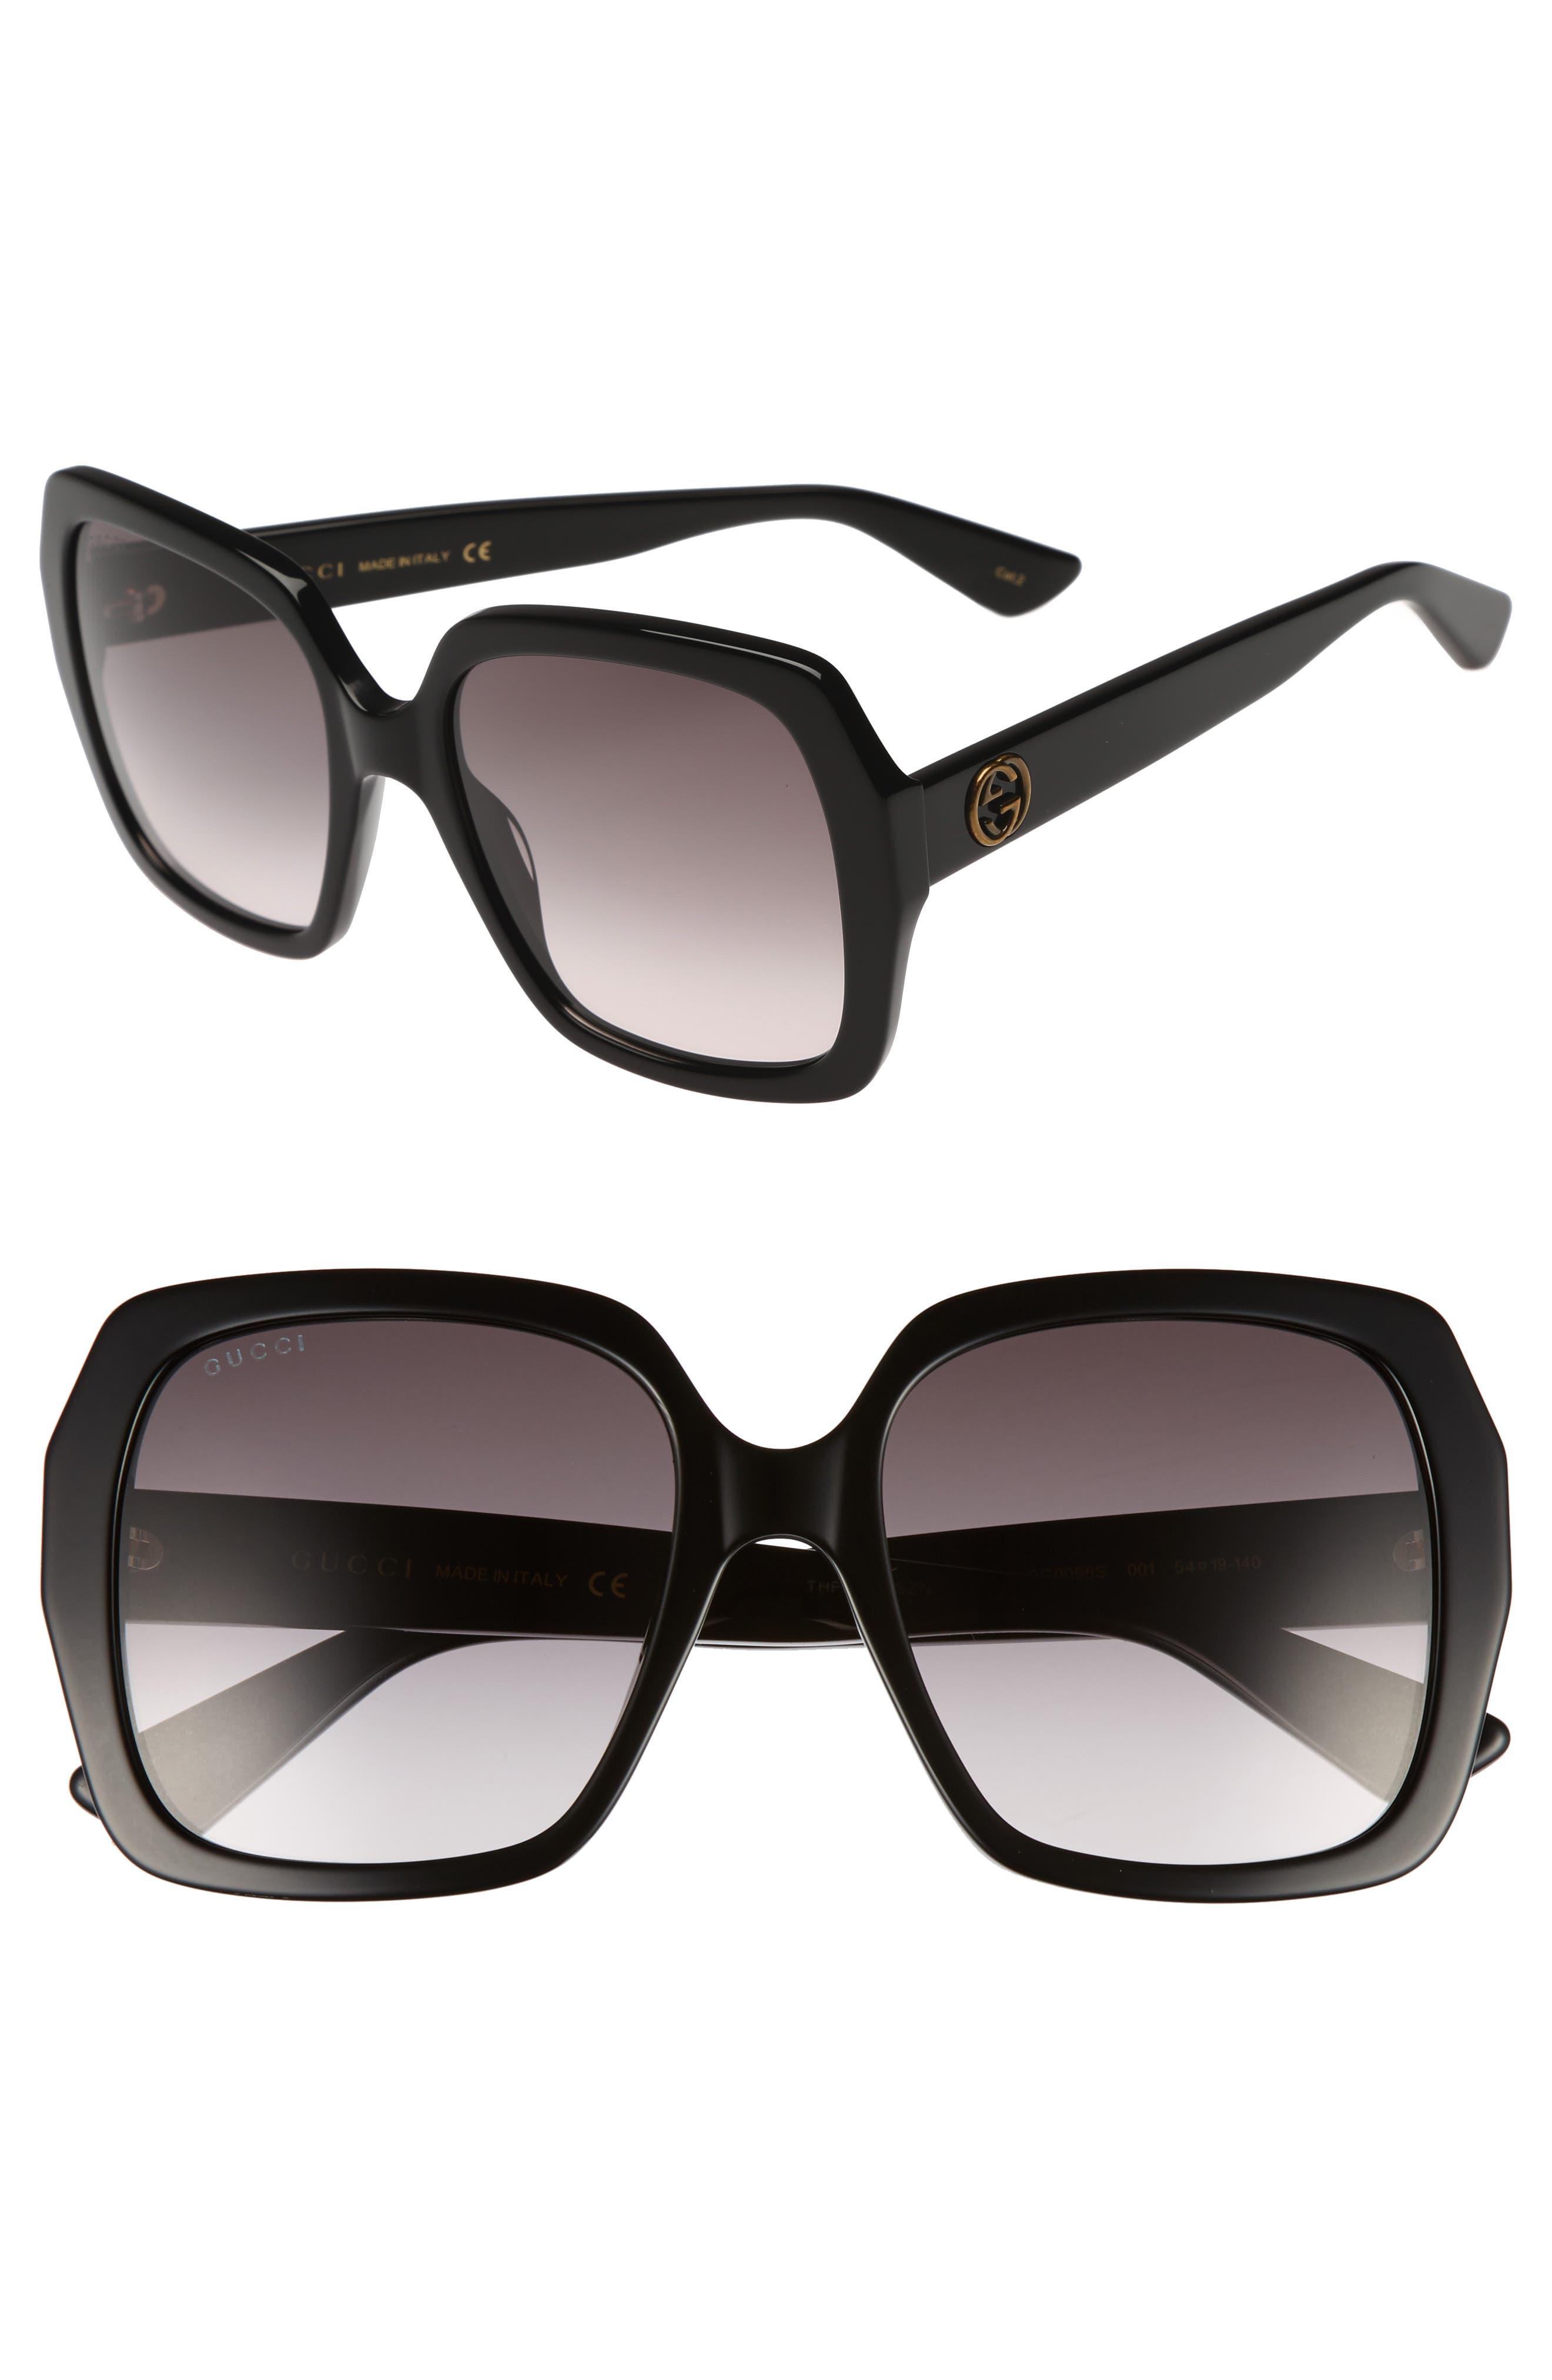 54mm Gradient Square Sunglasses,                             Main thumbnail 1, color,                             Black/ Grey